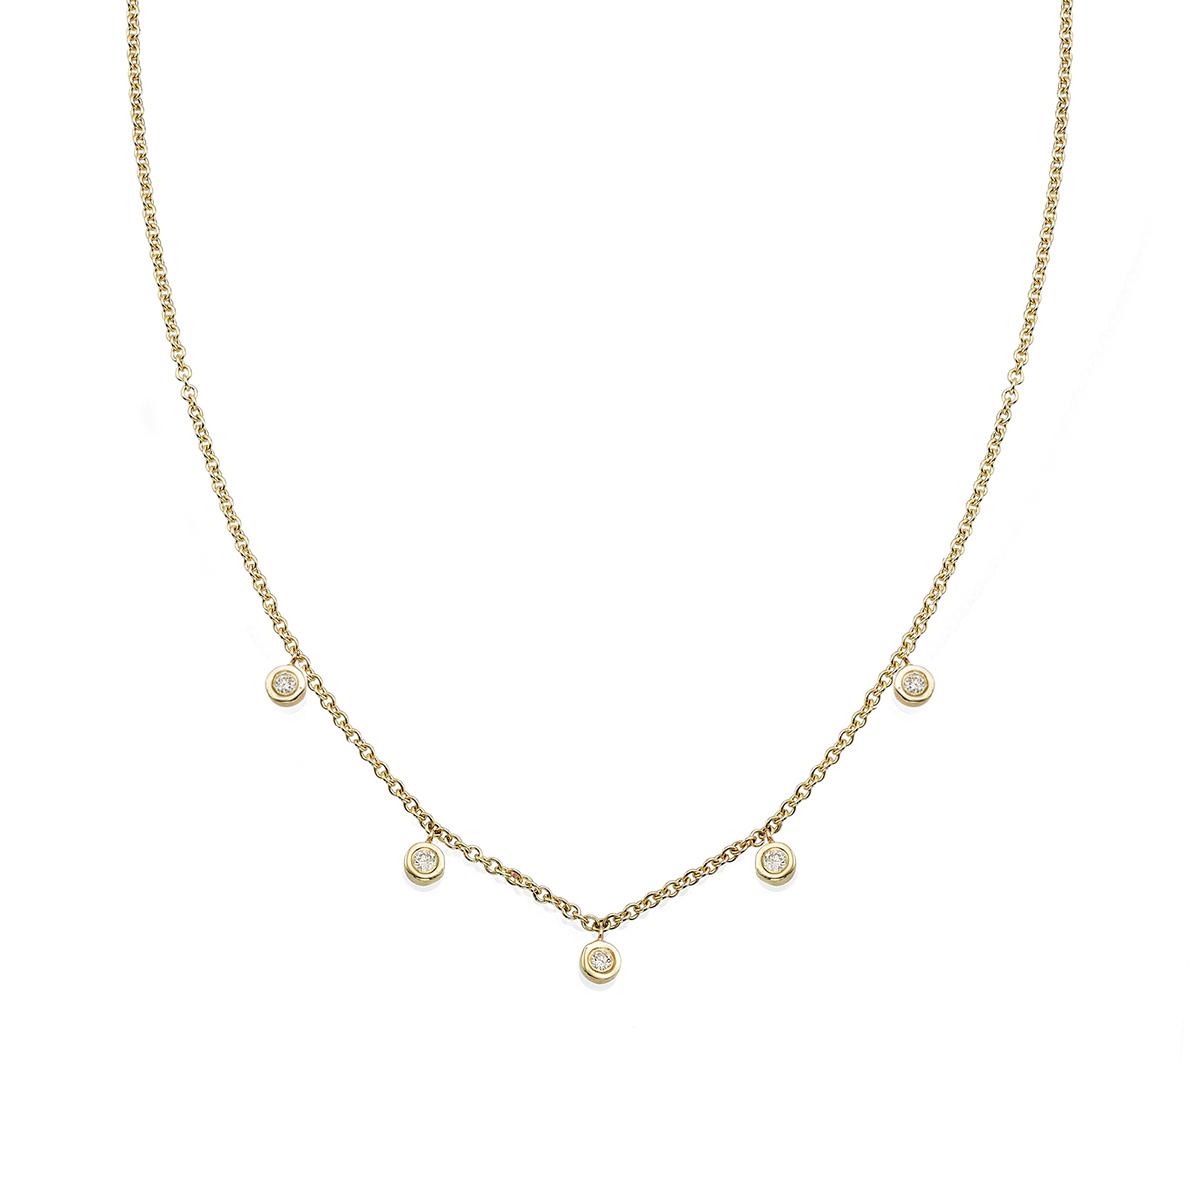 Delicate 5 Diamonds Necklace